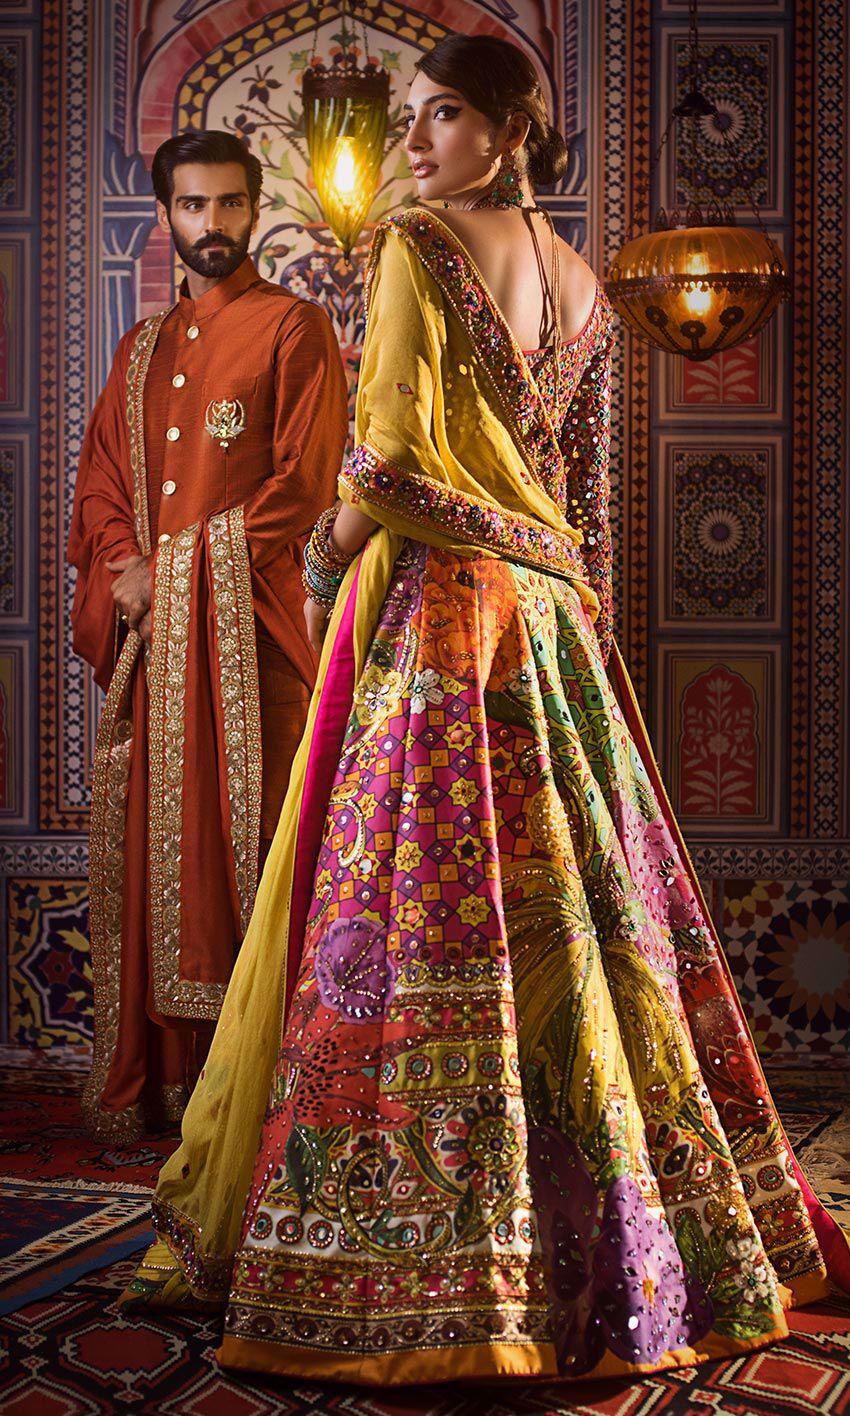 Nomi Ansari Yellow choli & Multi color lehnga bridal dress mehndi day back-side